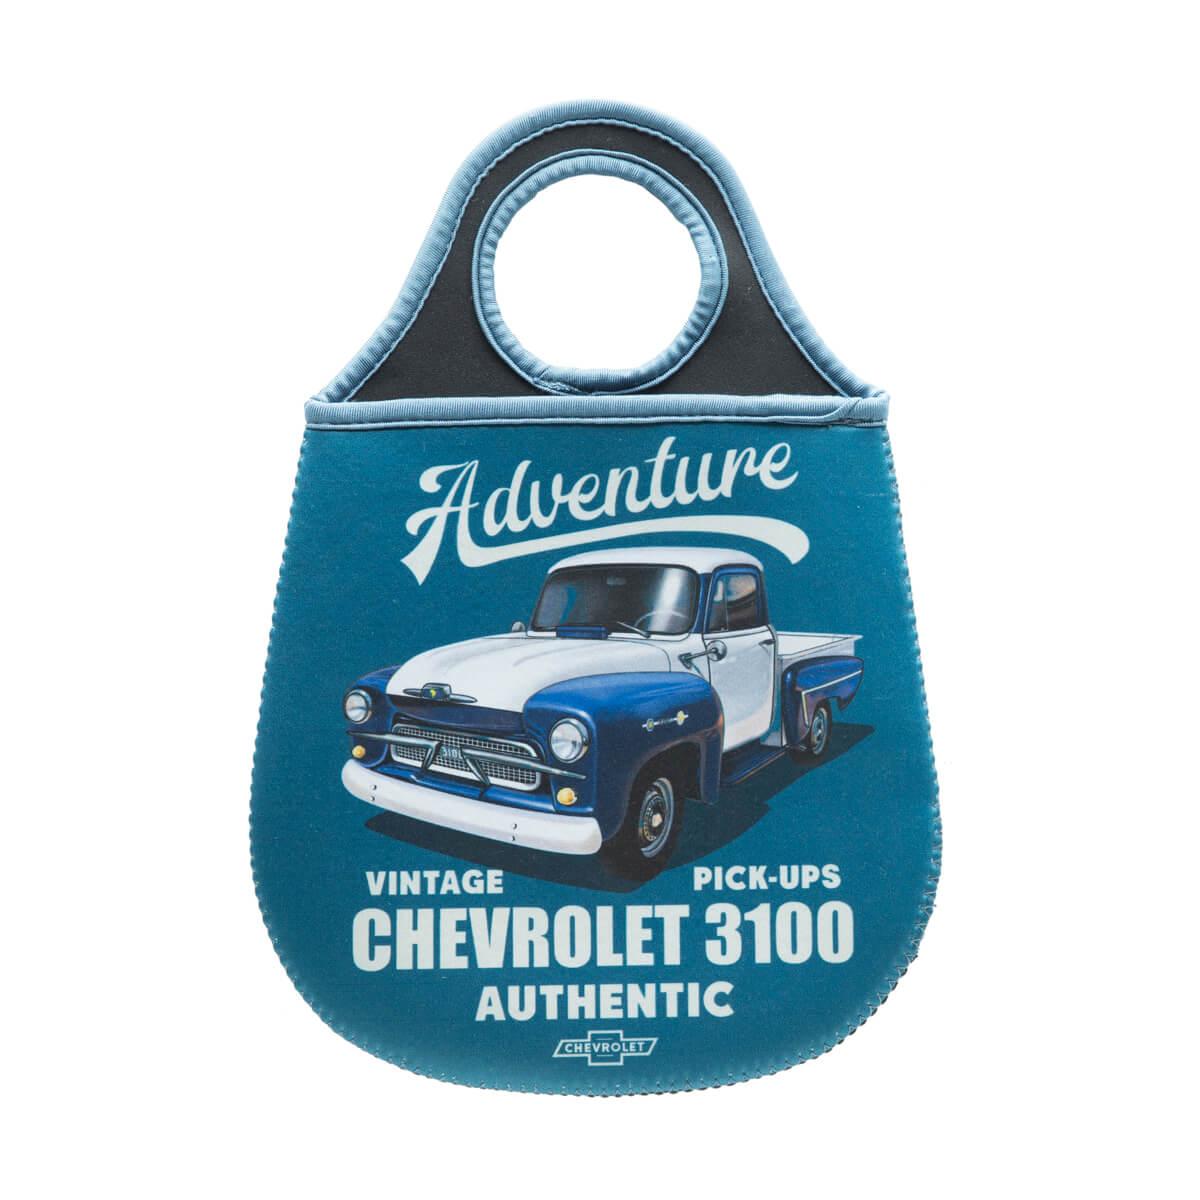 Lixeira de Carro Neoprene Chevrolet - Pick up 3100 - Azul